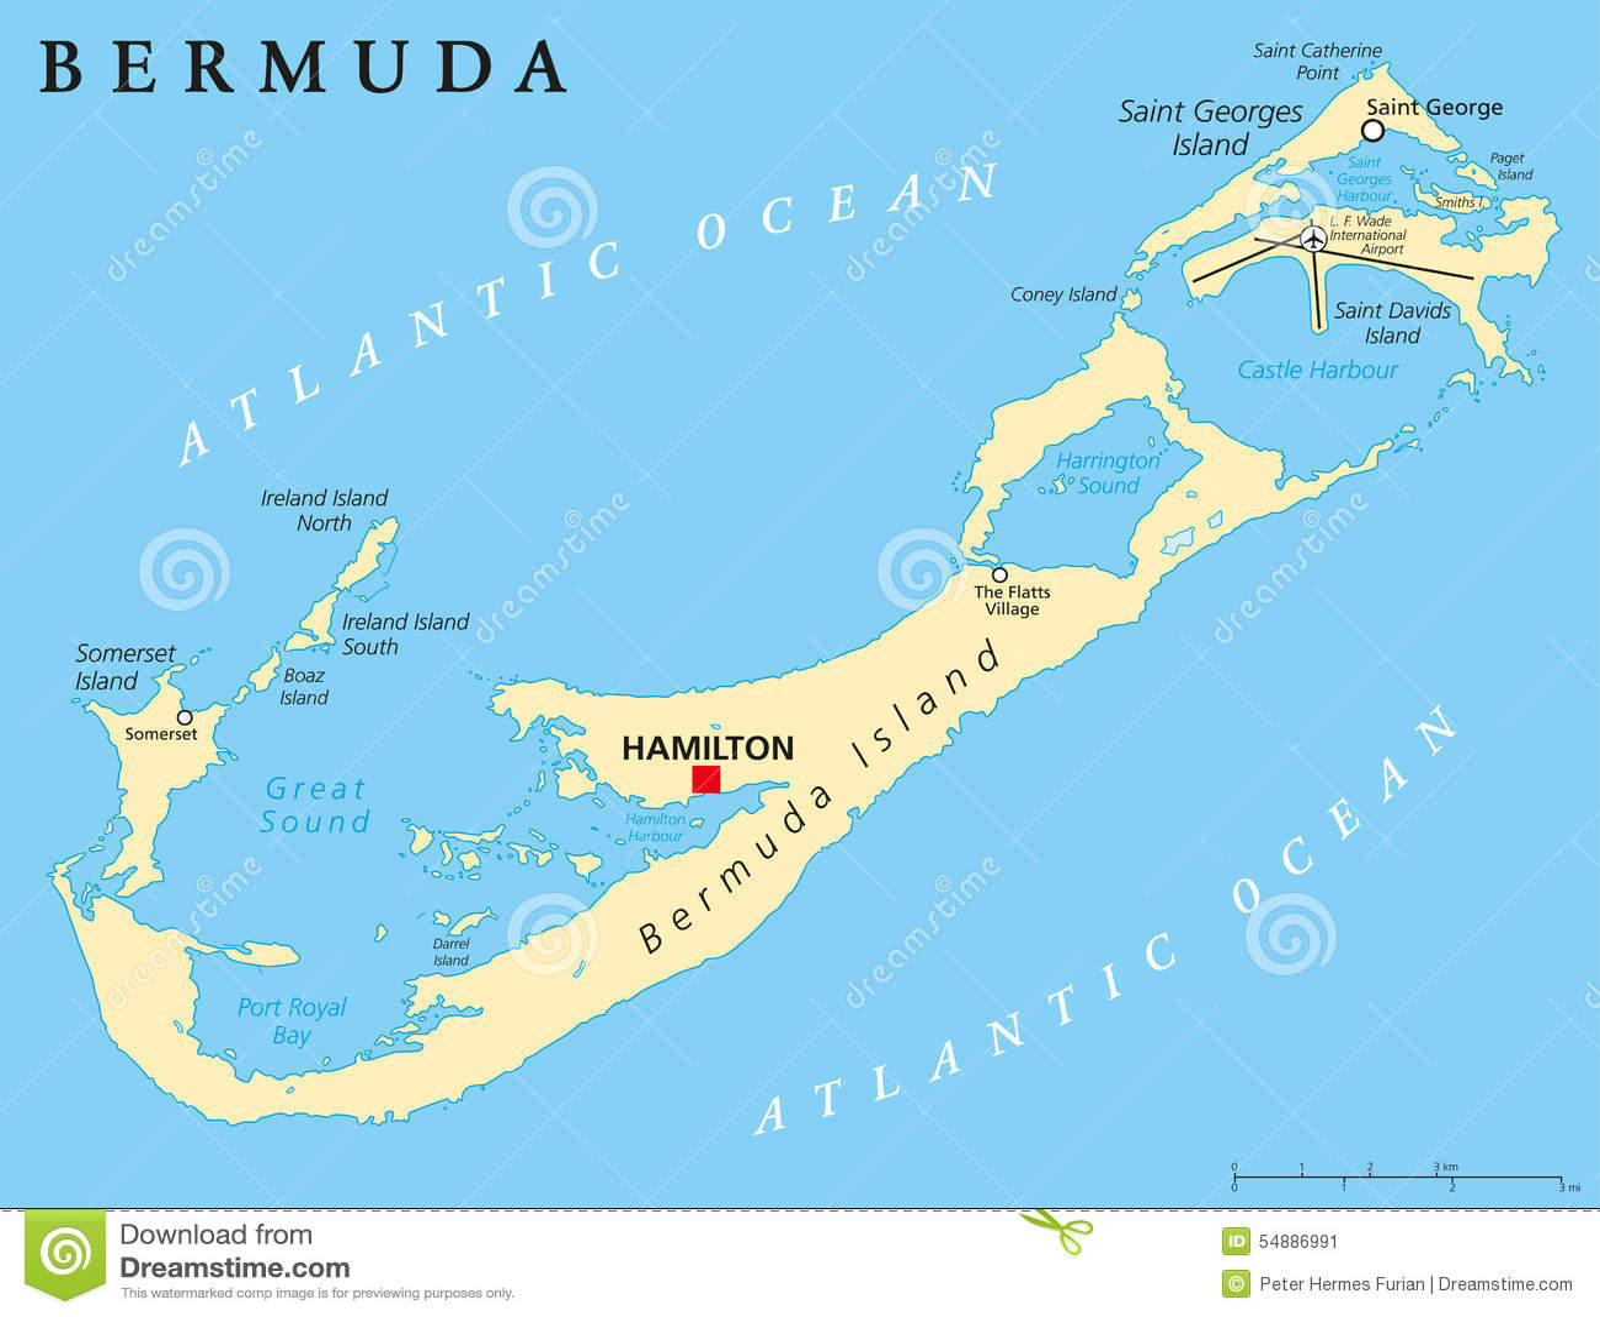 BBC News - Regions and territories: Bermuda